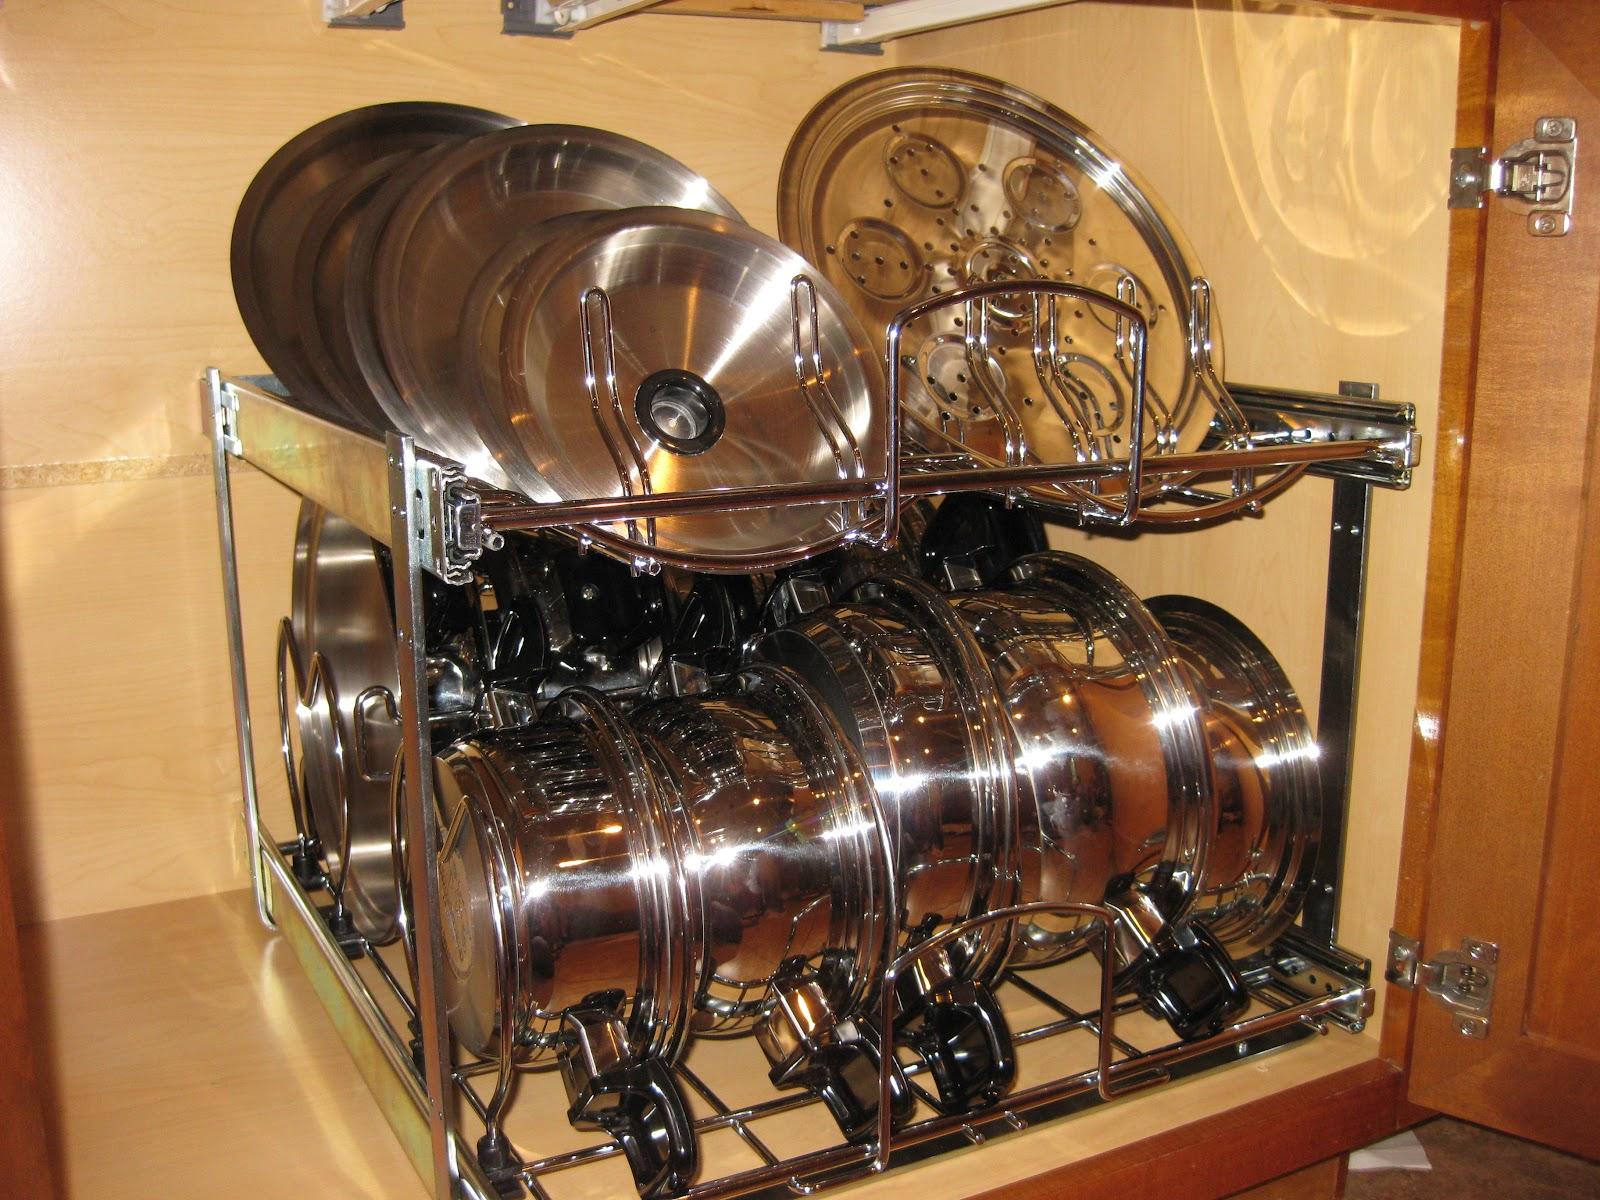 Pots And Pans Cabinet.Kitchen Pots And Pans Rack Cabinet Black ...